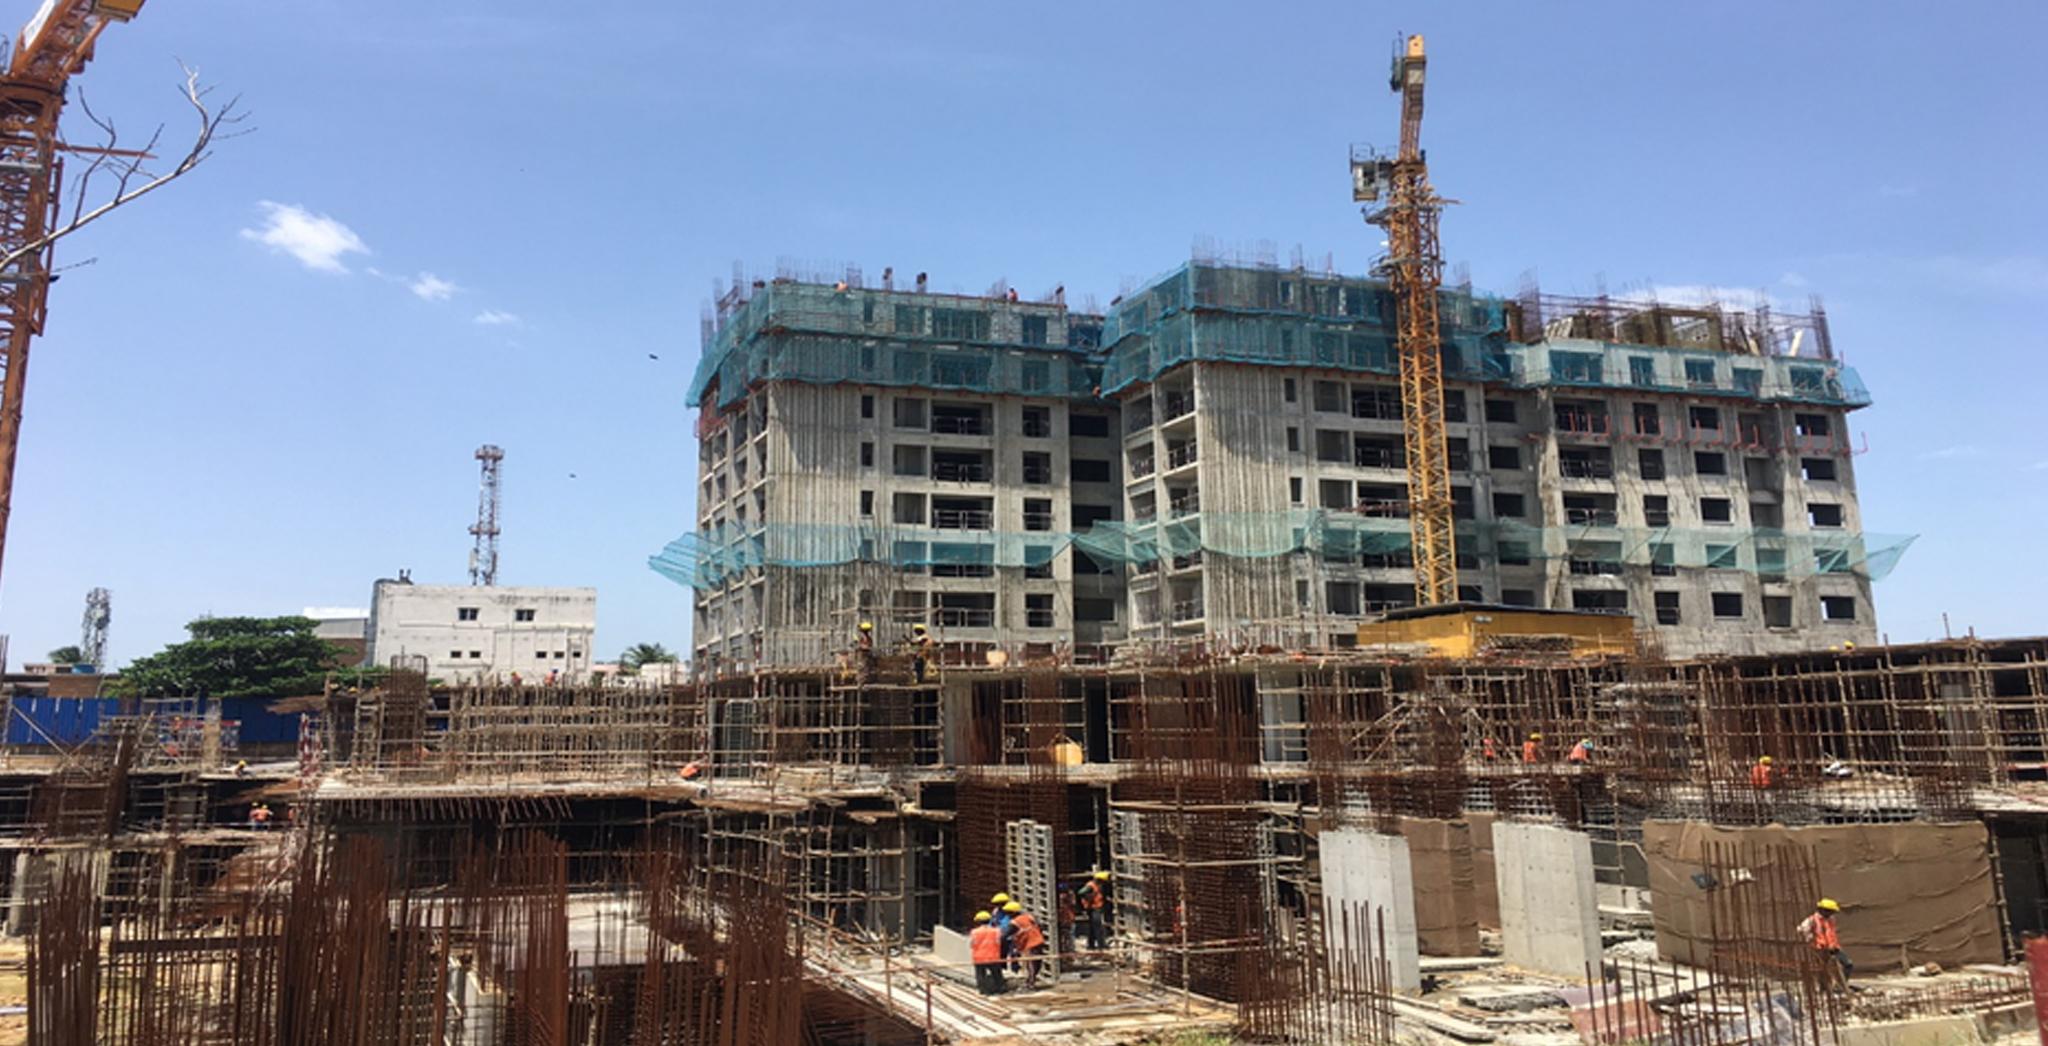 Jul 2021 - Non Tower: Ground floor and Podium work is in progress